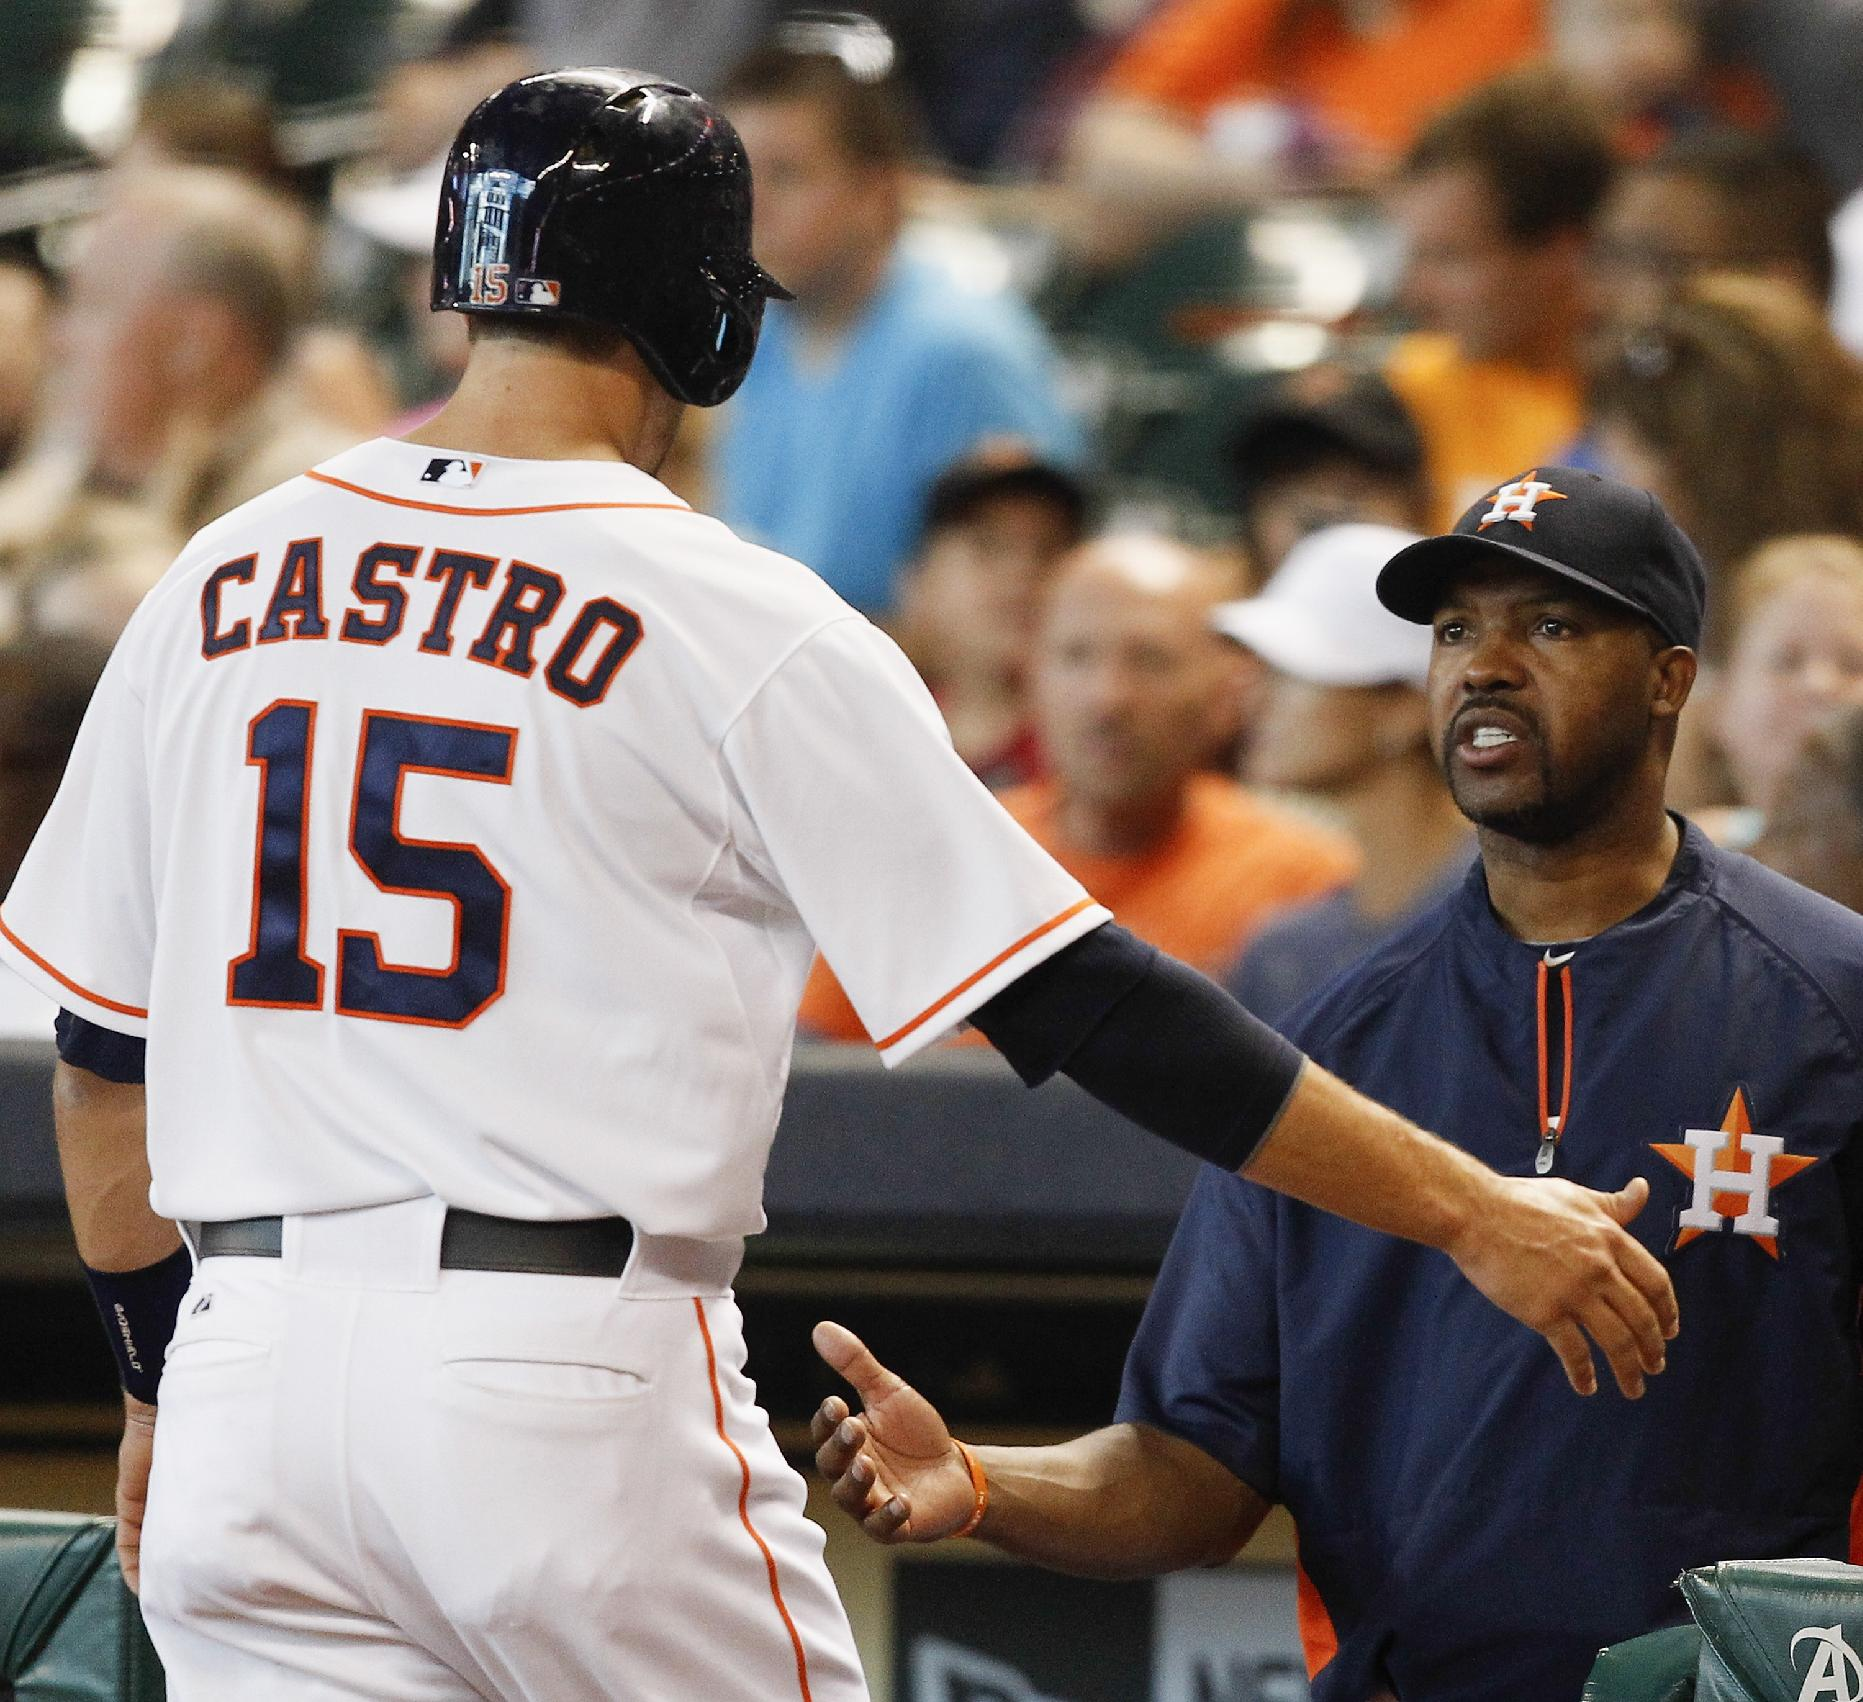 Colabello's slam gives Twins 10-6 win over Astros